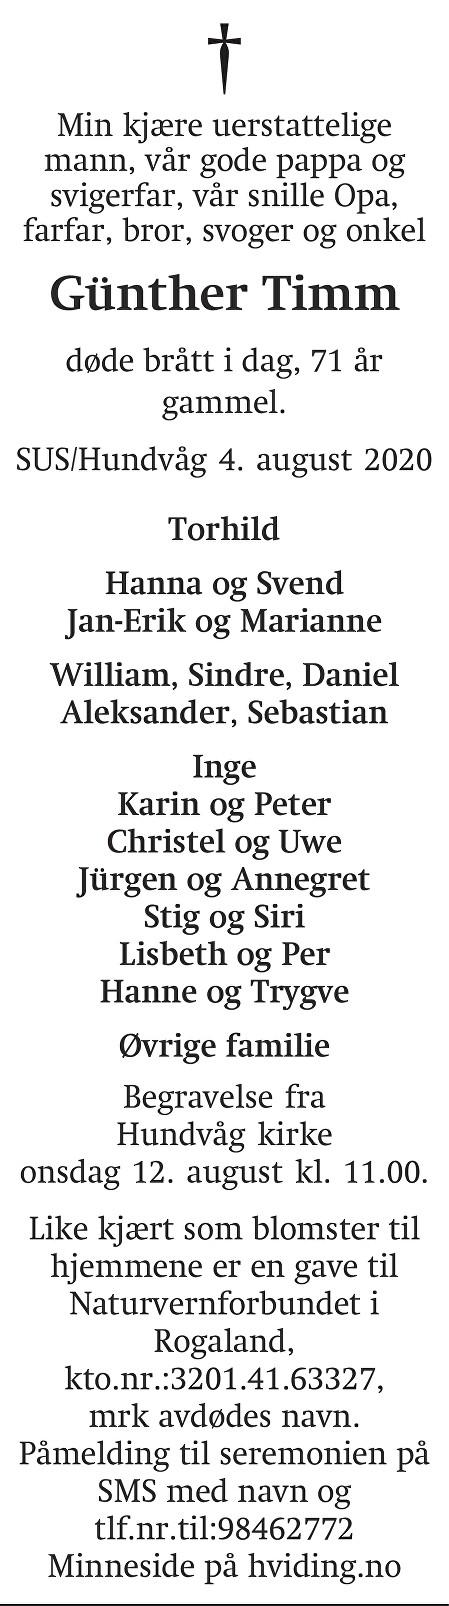 Günther Timm Dødsannonse